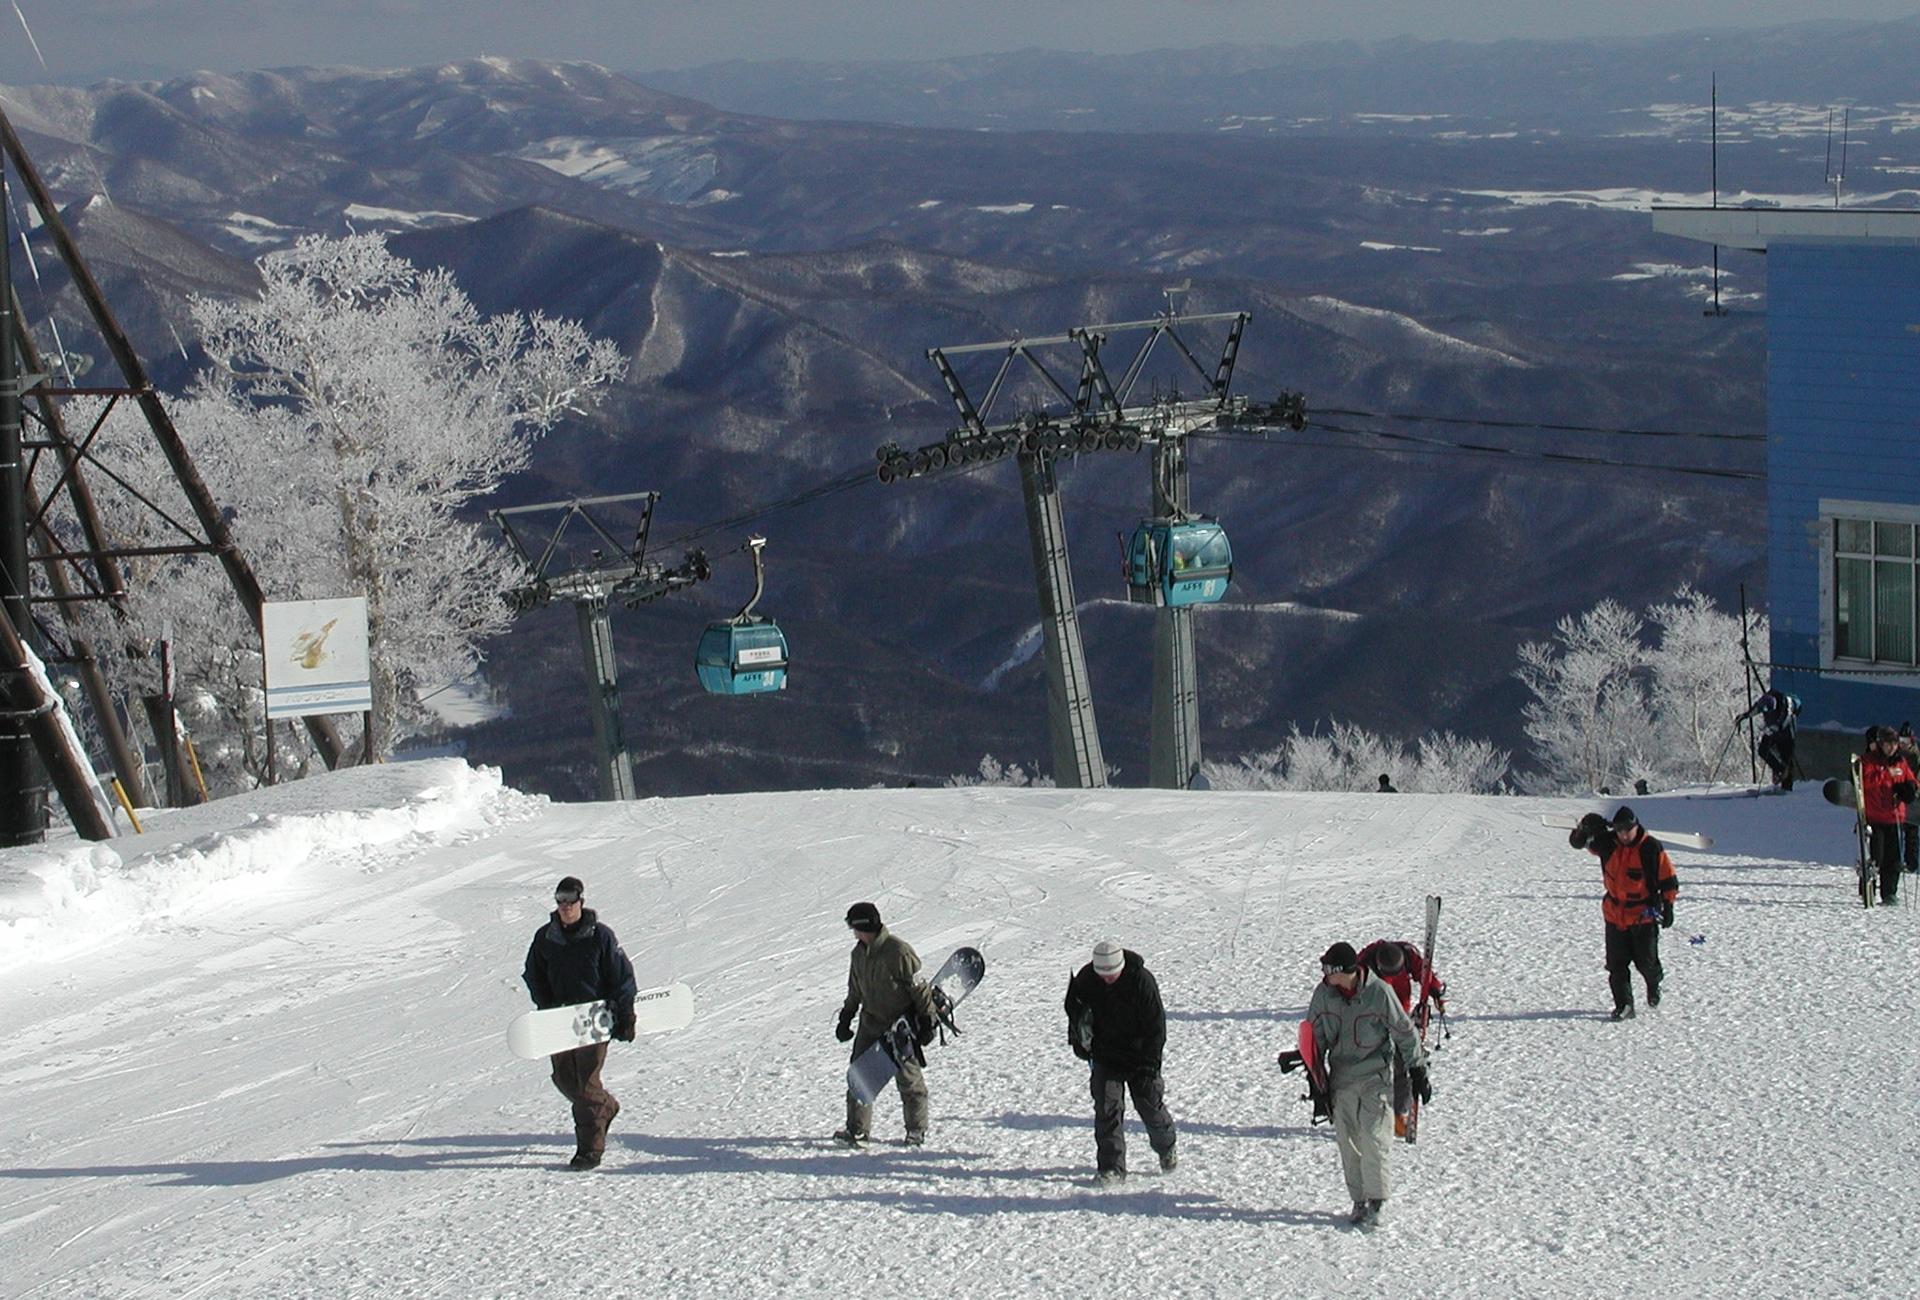 appi ski & snowboard | 35th force support squadron